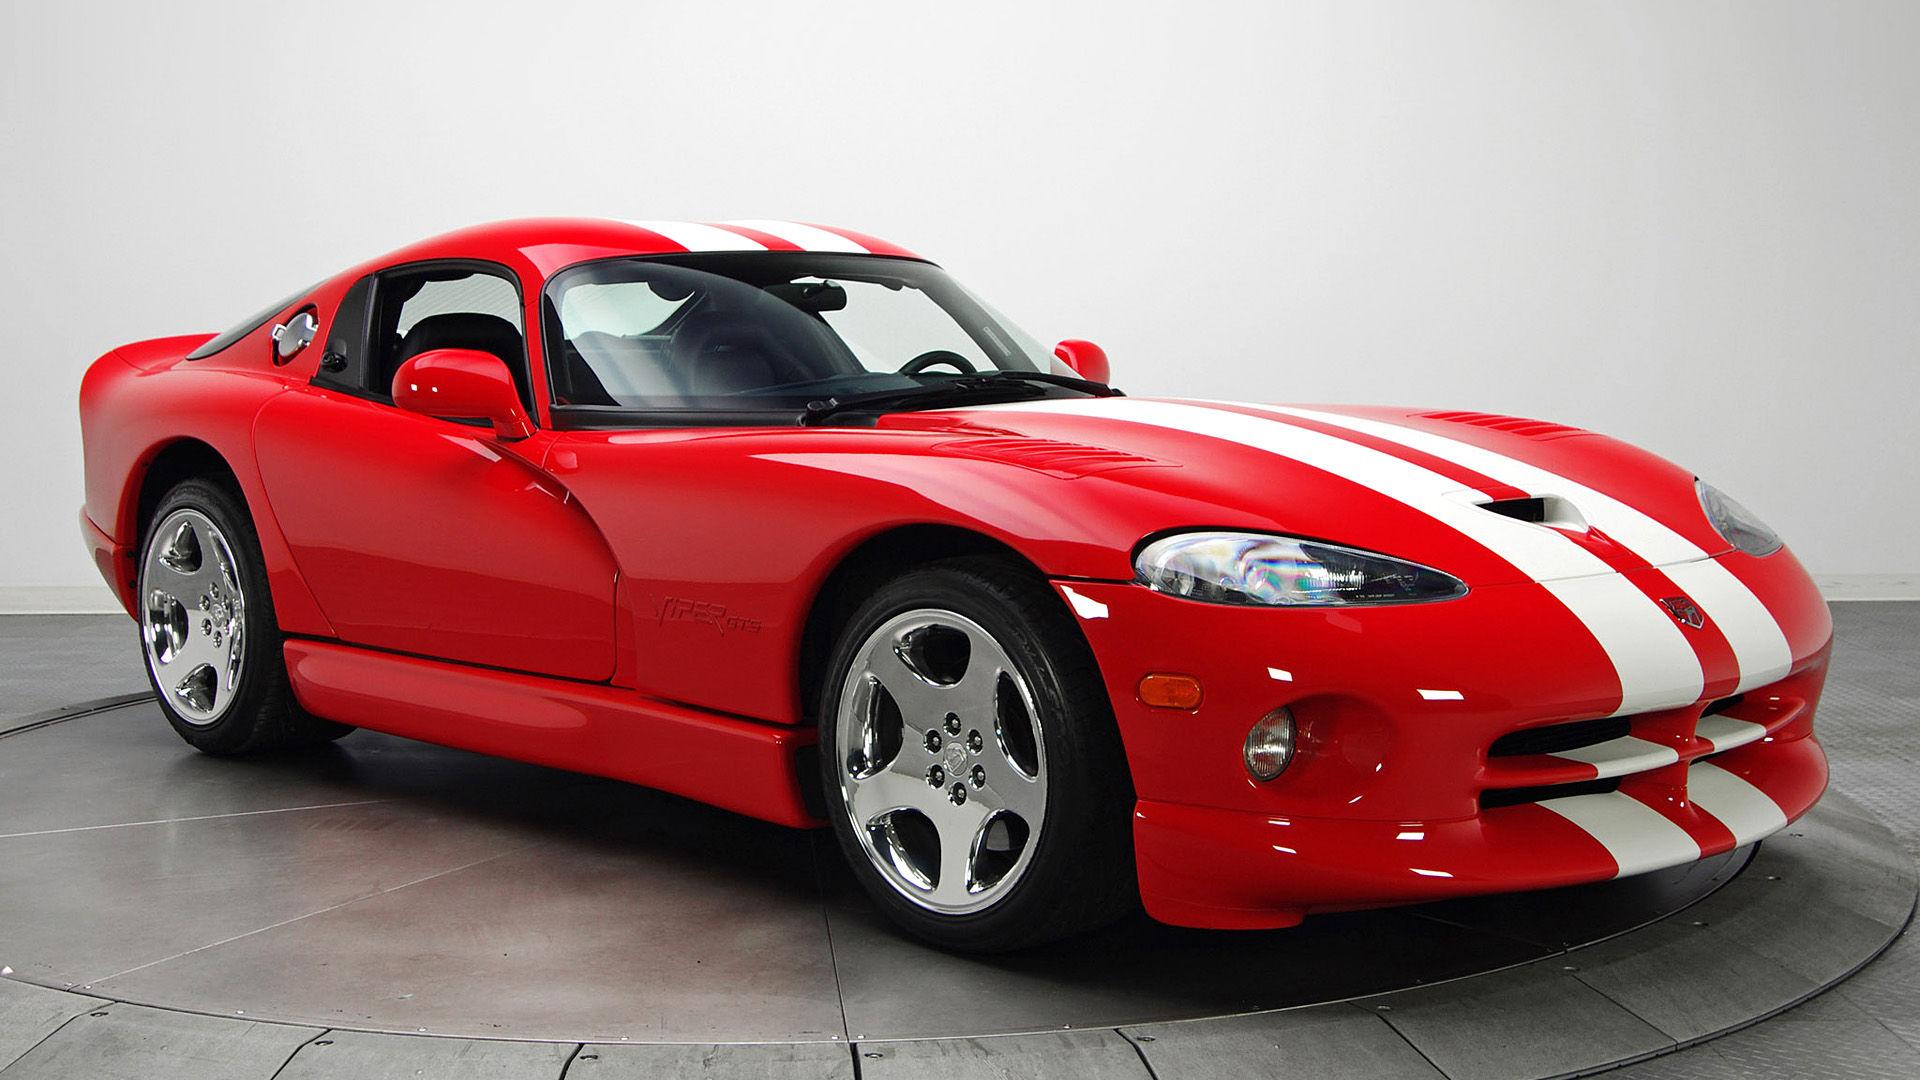 2002 Dodge Viper GTS Final Edition